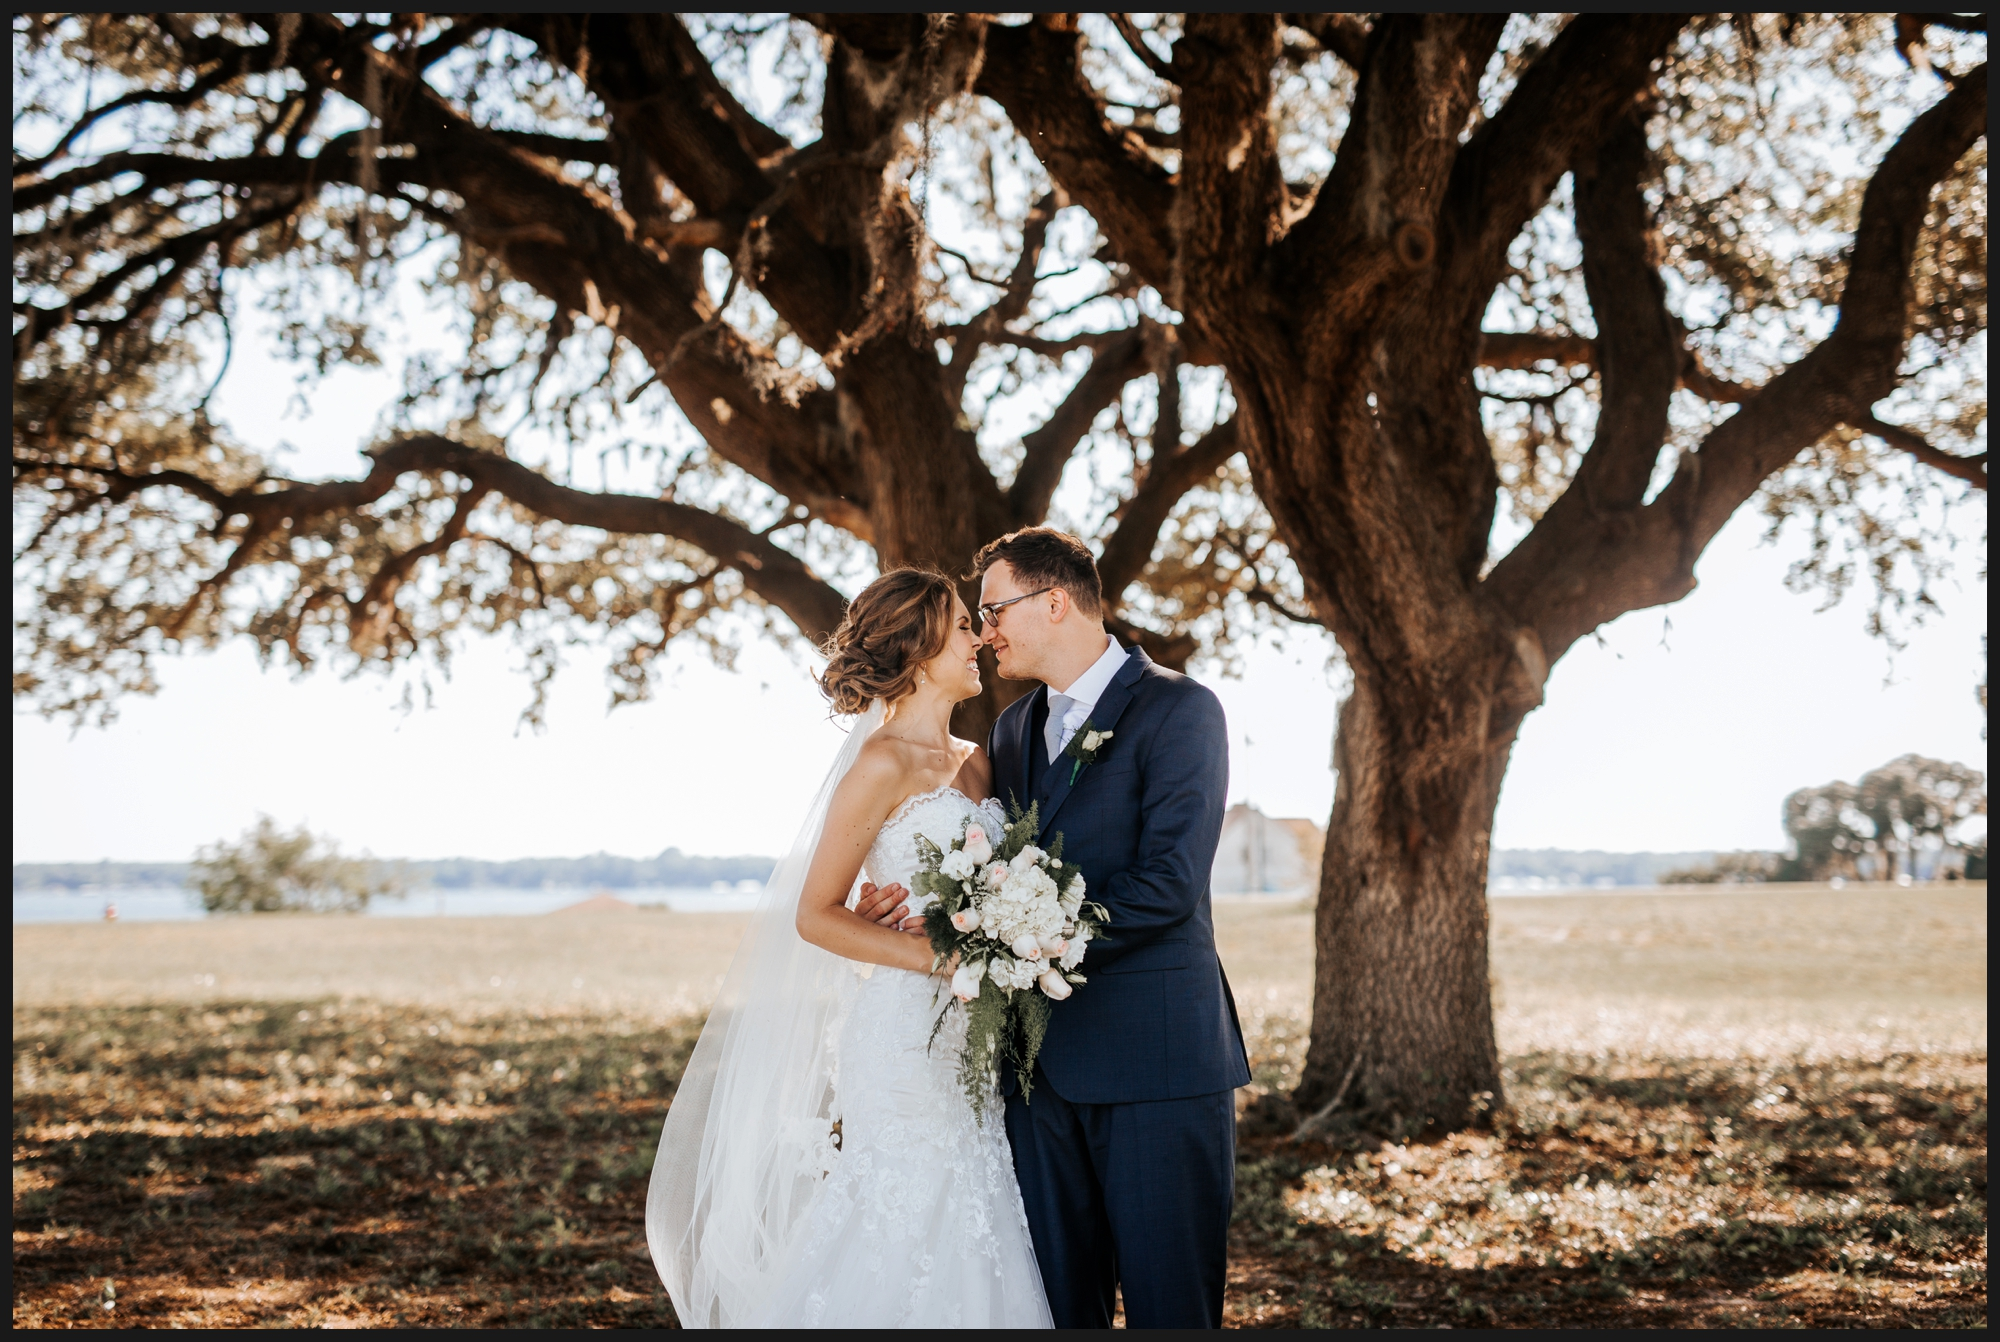 Orlando-Wedding-Photographer-destination-wedding-photographer-florida-wedding-photographer-bohemian-wedding-photographer_0088.jpg